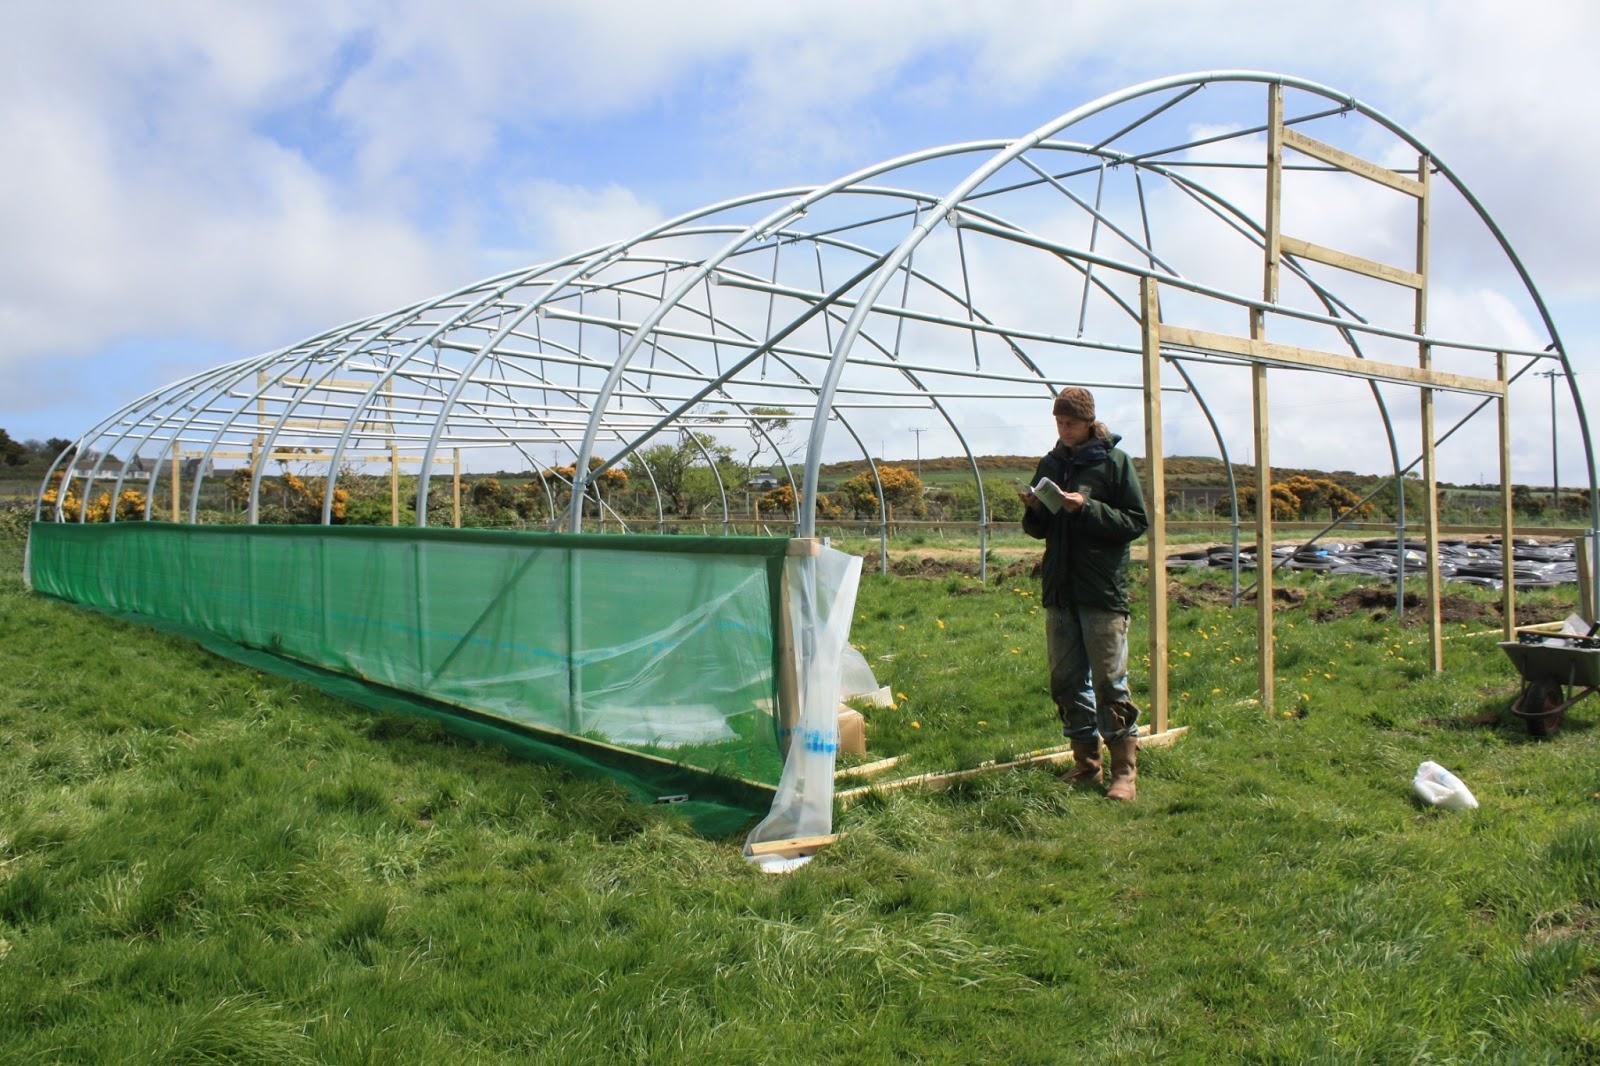 Bosavern Community Farm Skinning The New Polytunnel